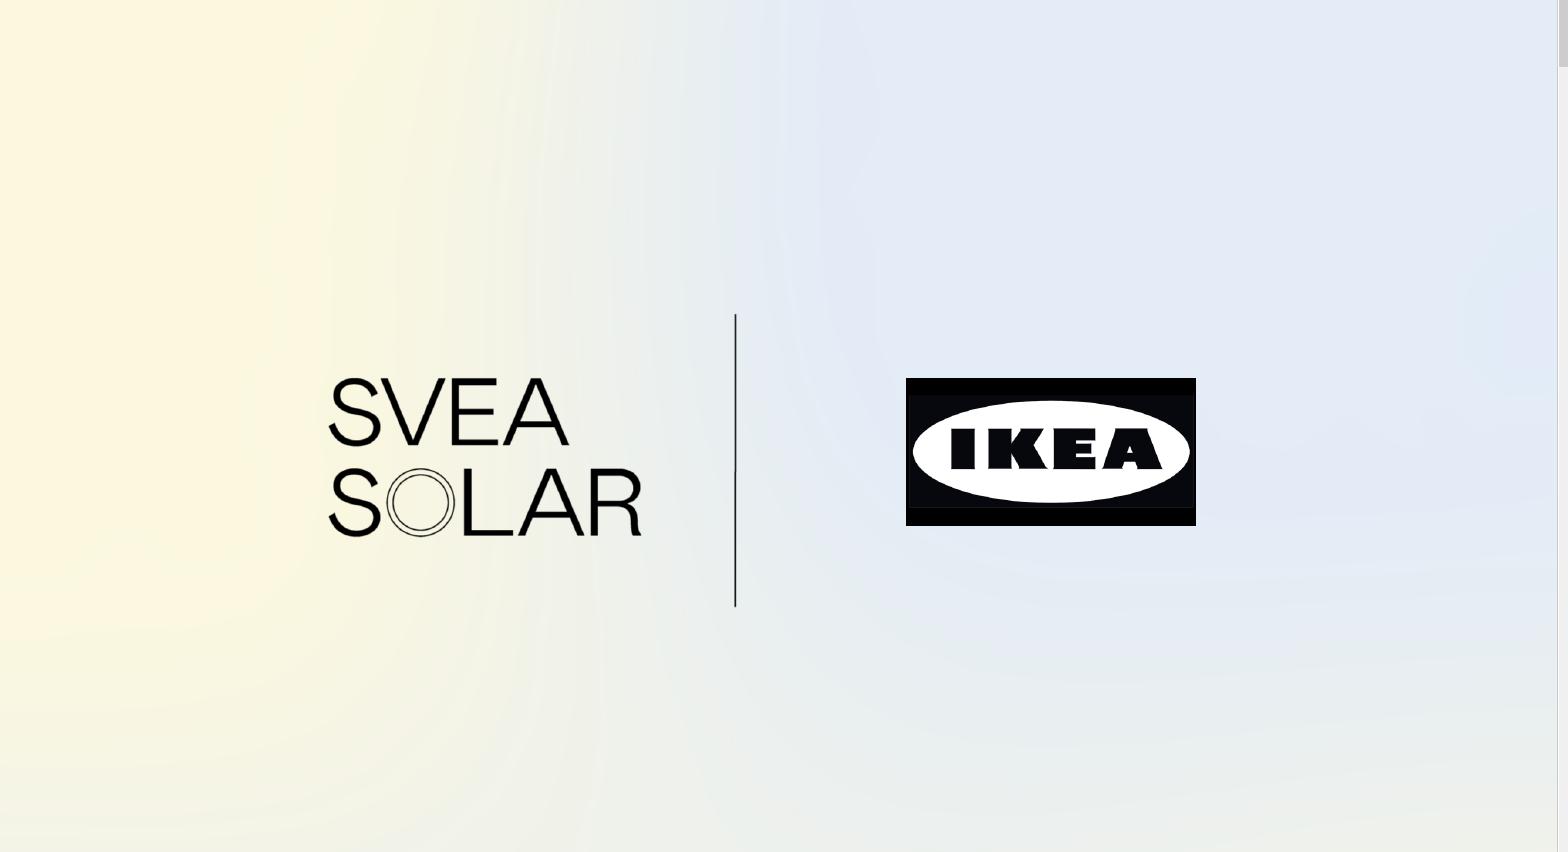 Kooperation Svea Solar x IKEA